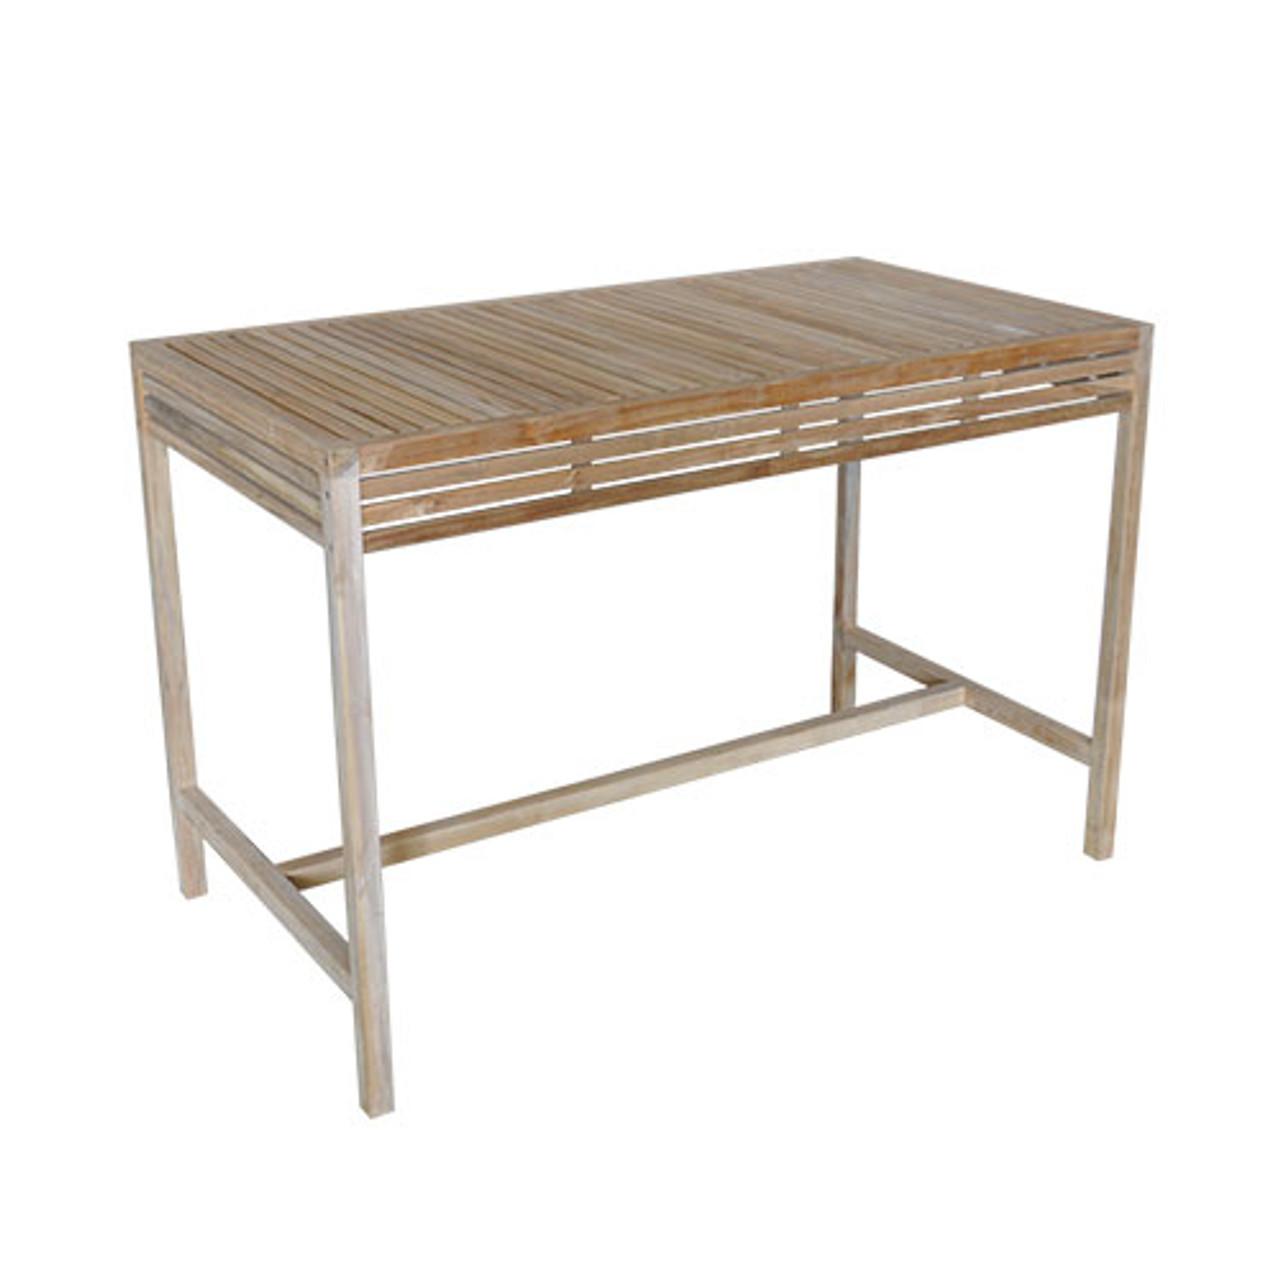 Breeze 150cm Natural Teak Bar Table